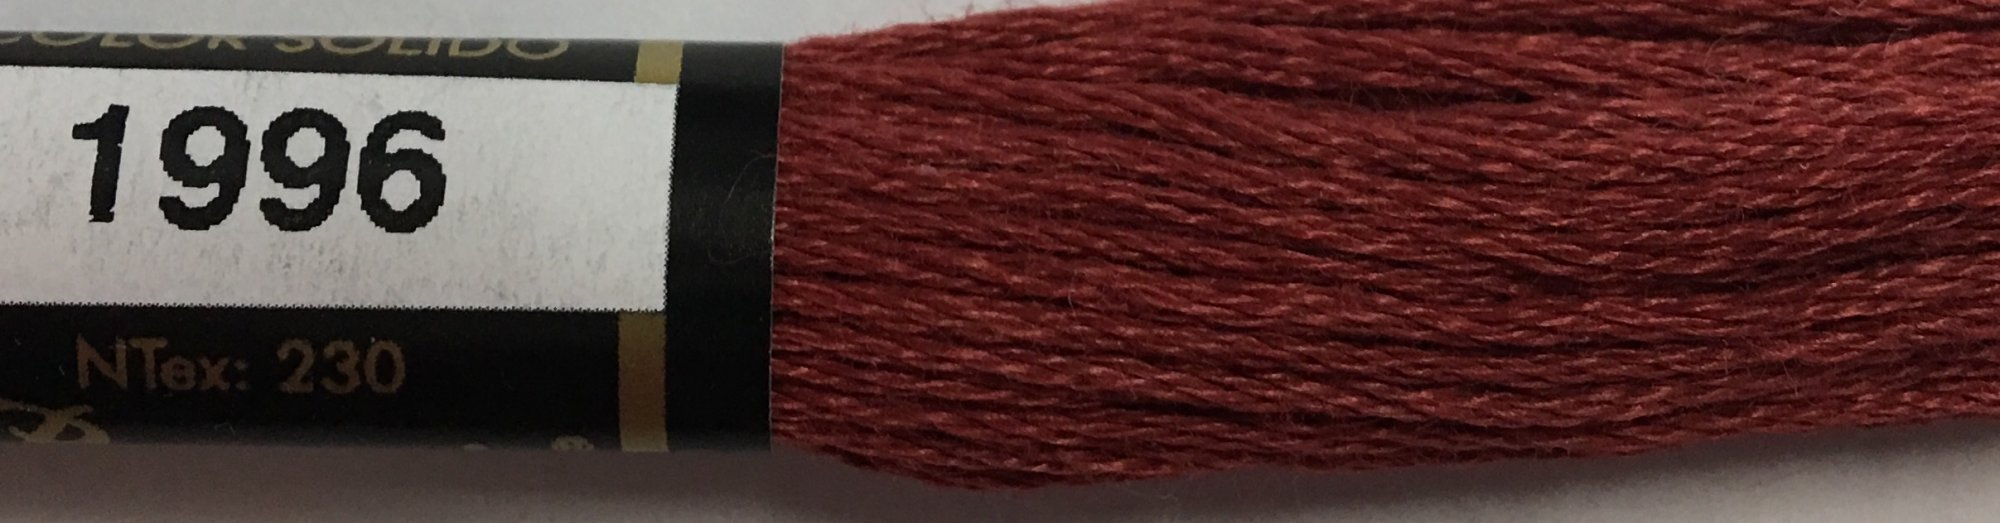 F1996 Presencia 100% Mercerized Finca Cotton 6 ply Embroidery Floss 8 meter skein